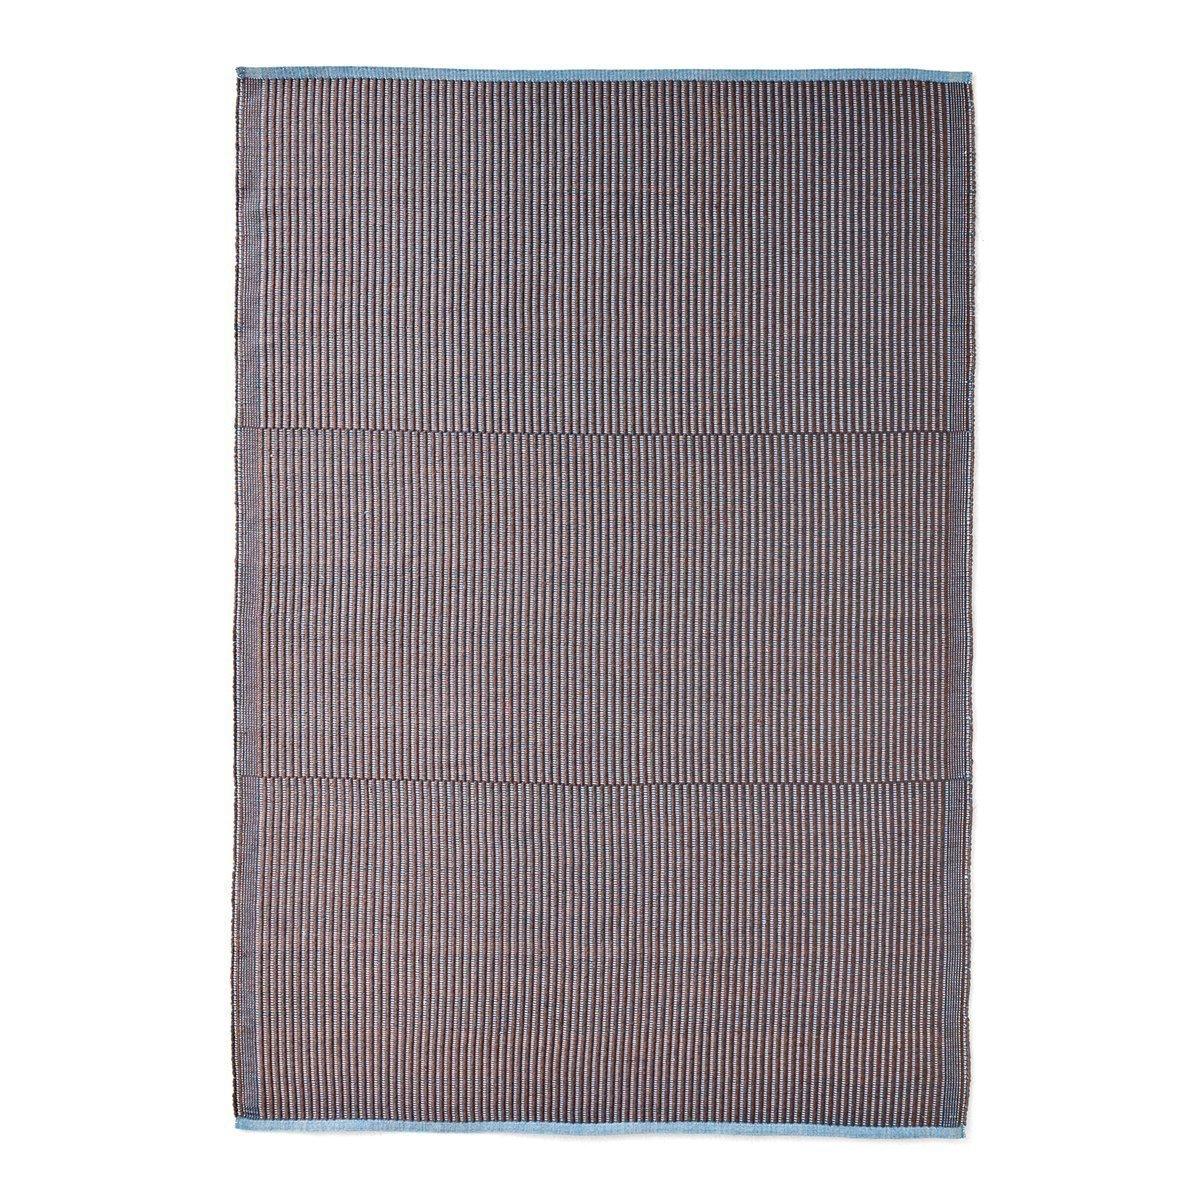 HAY Tapis Vloerkleed Chestnut & Blue - 200 x 140 cm.